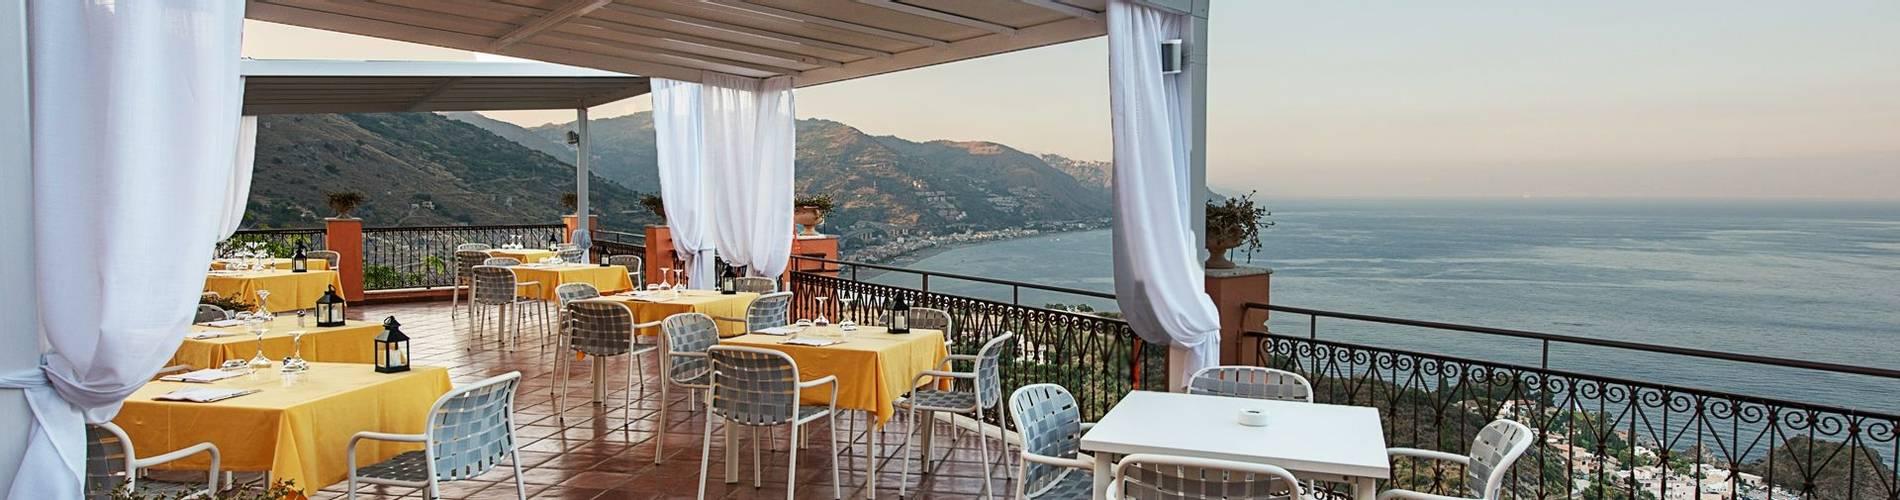 Grand Hotel Miramare, Sicily, Italy (6).jpg